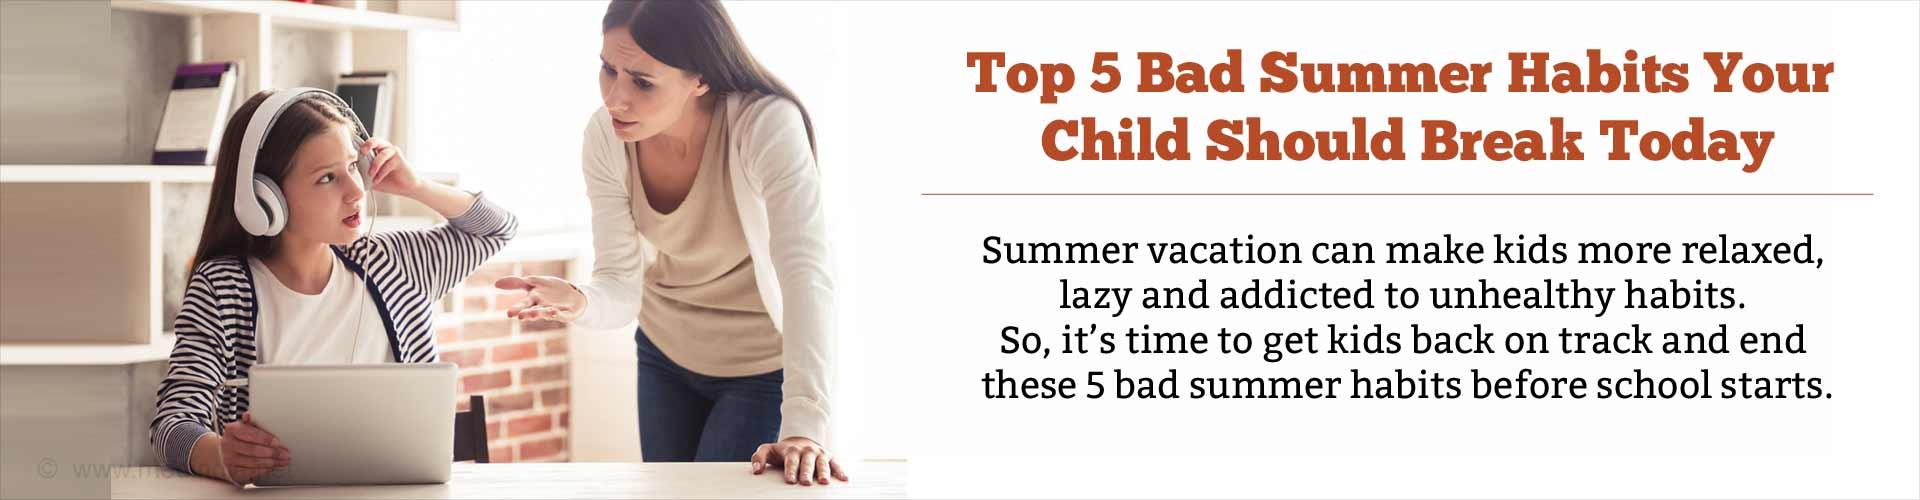 Top 5 Bad Summer Habits Your Child Should Break Today